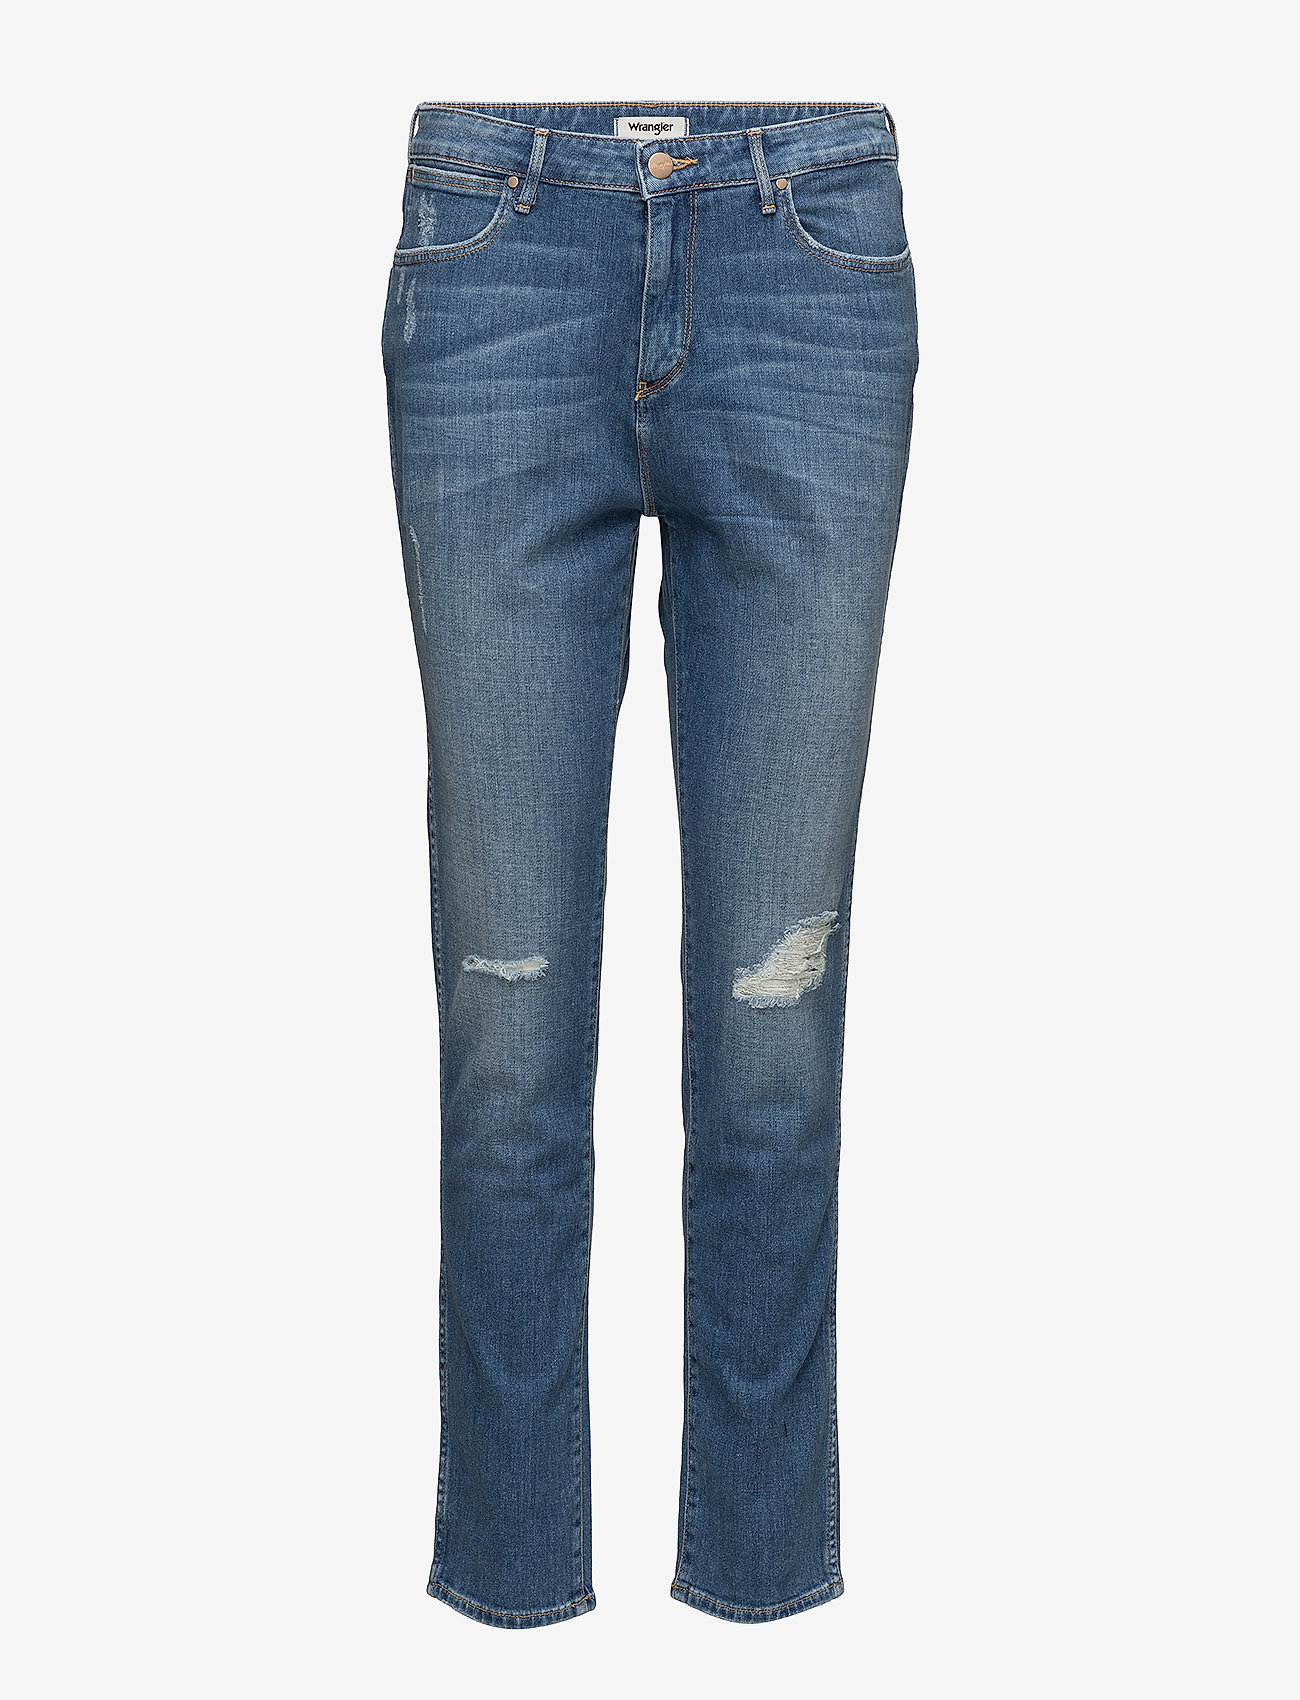 Wrangler - BOYFRIEND - boyfriend jeans - soft worn - 0